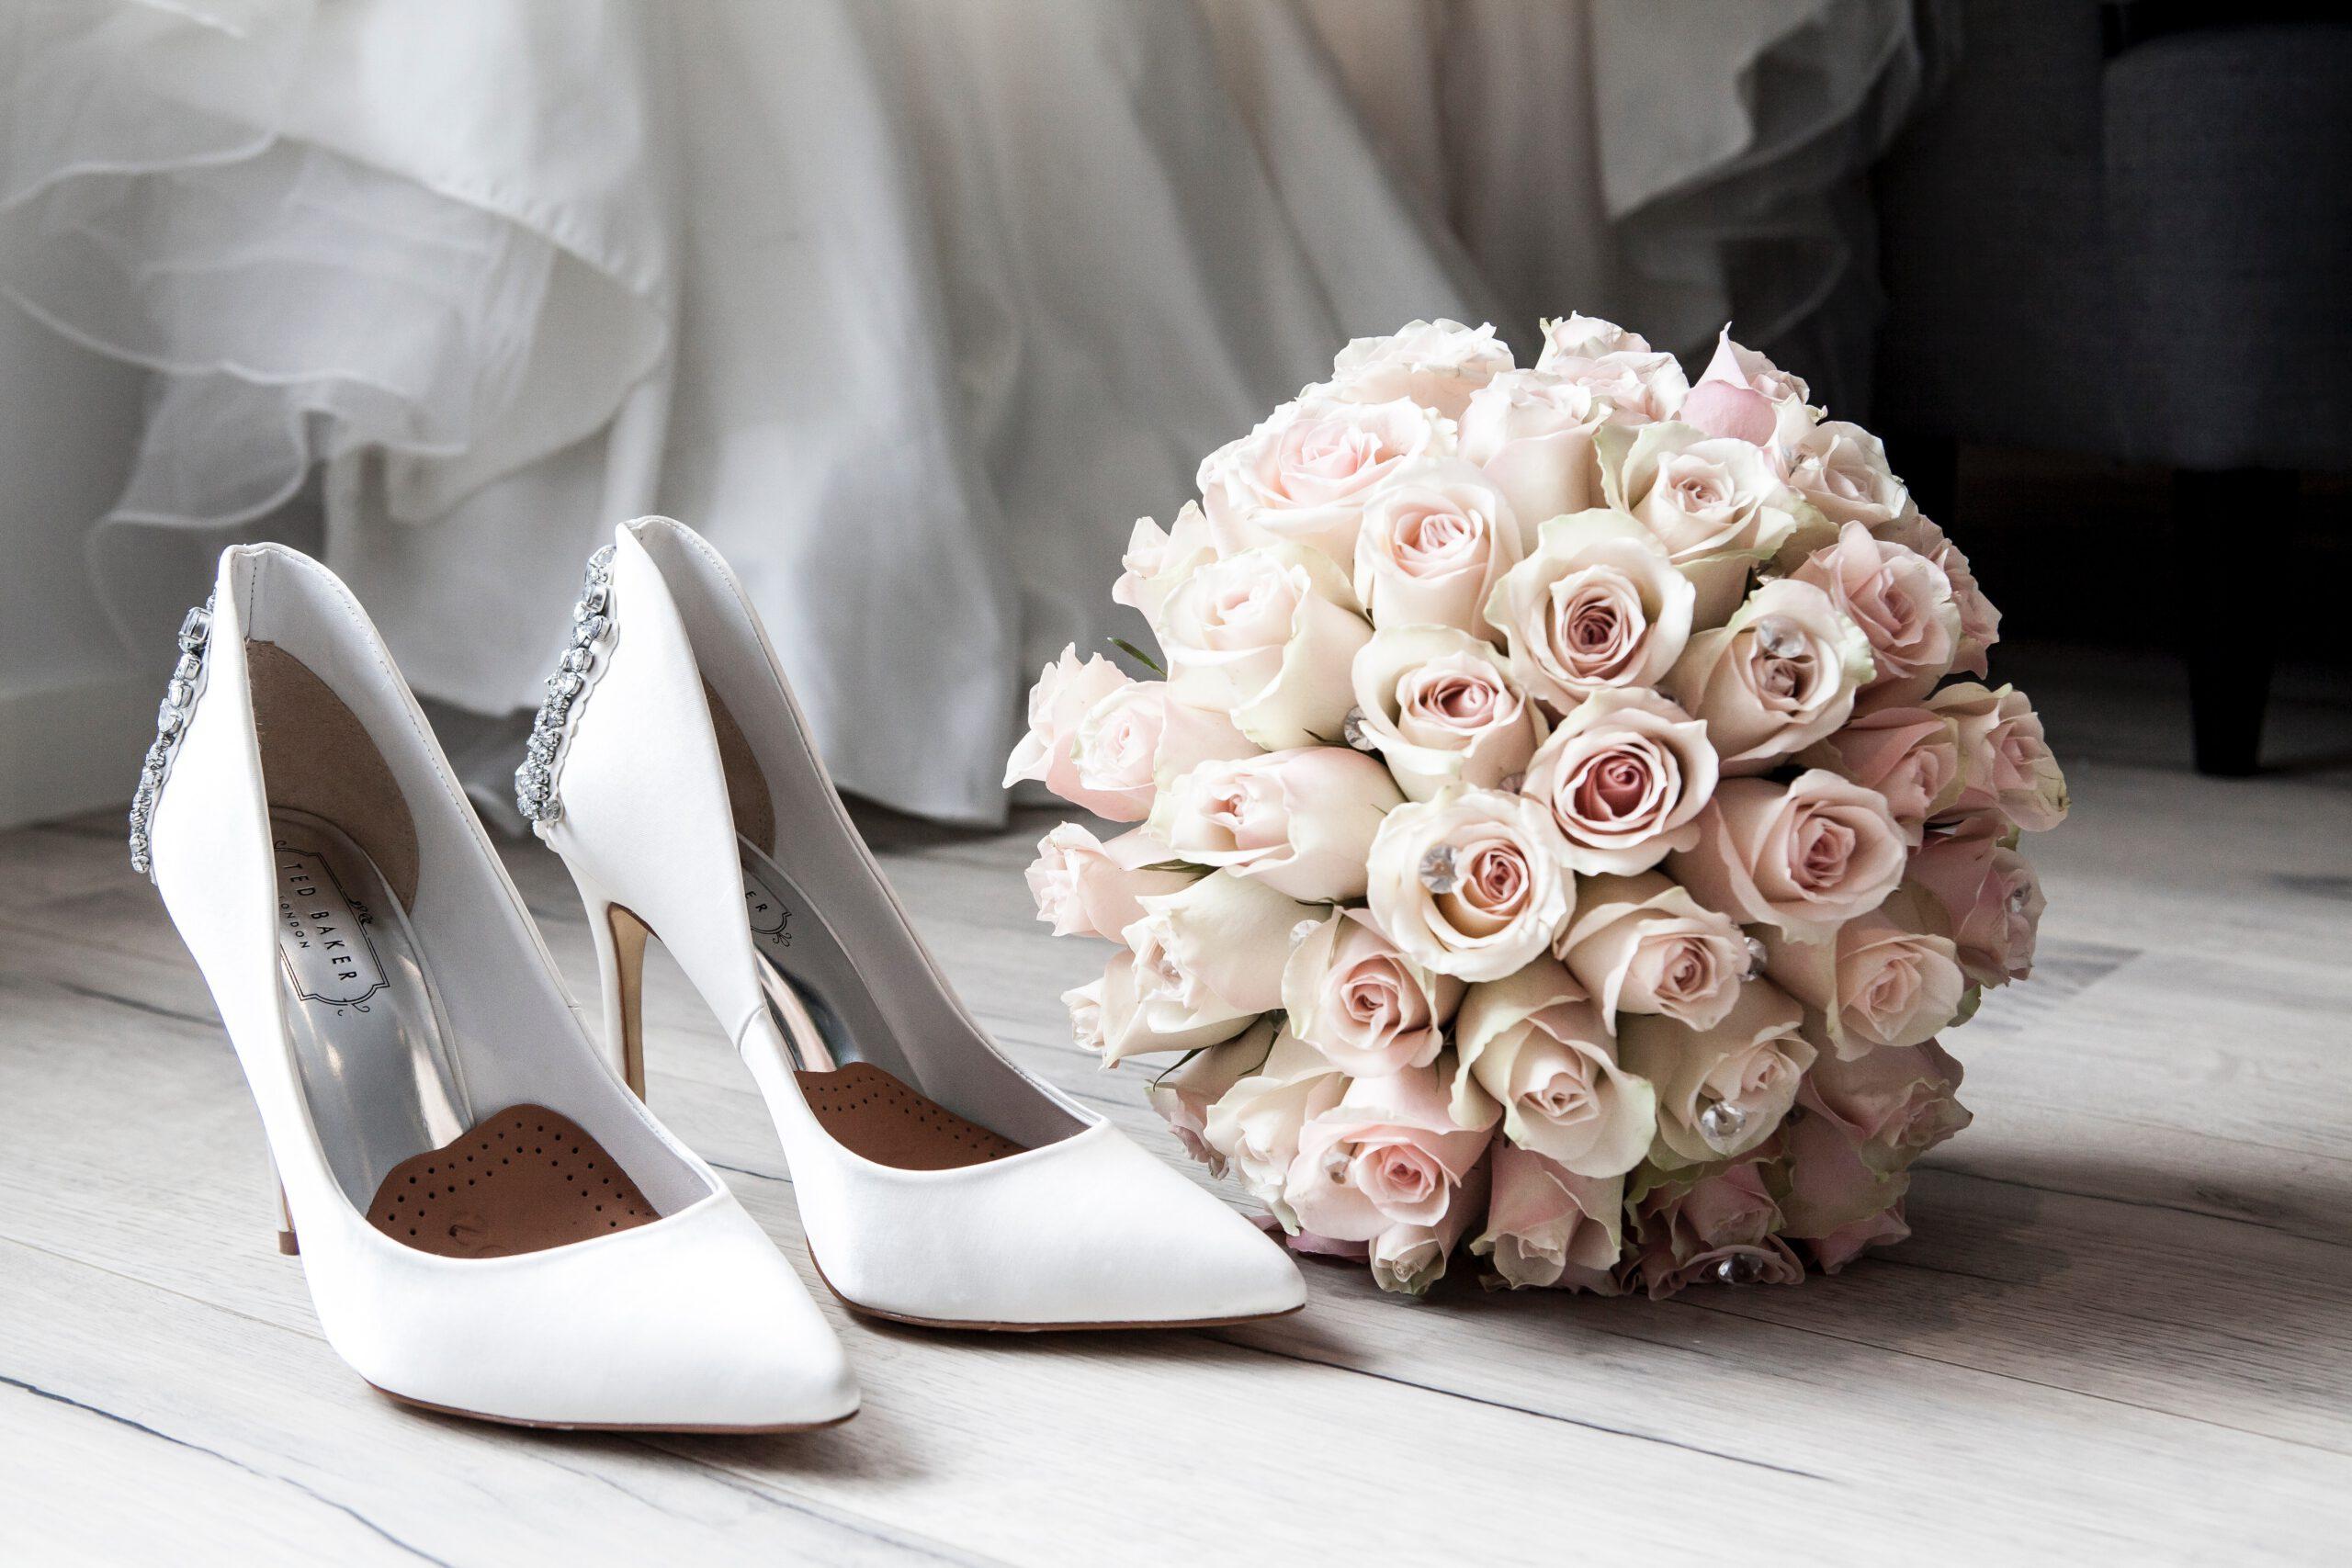 bruidsschoenen kiezen